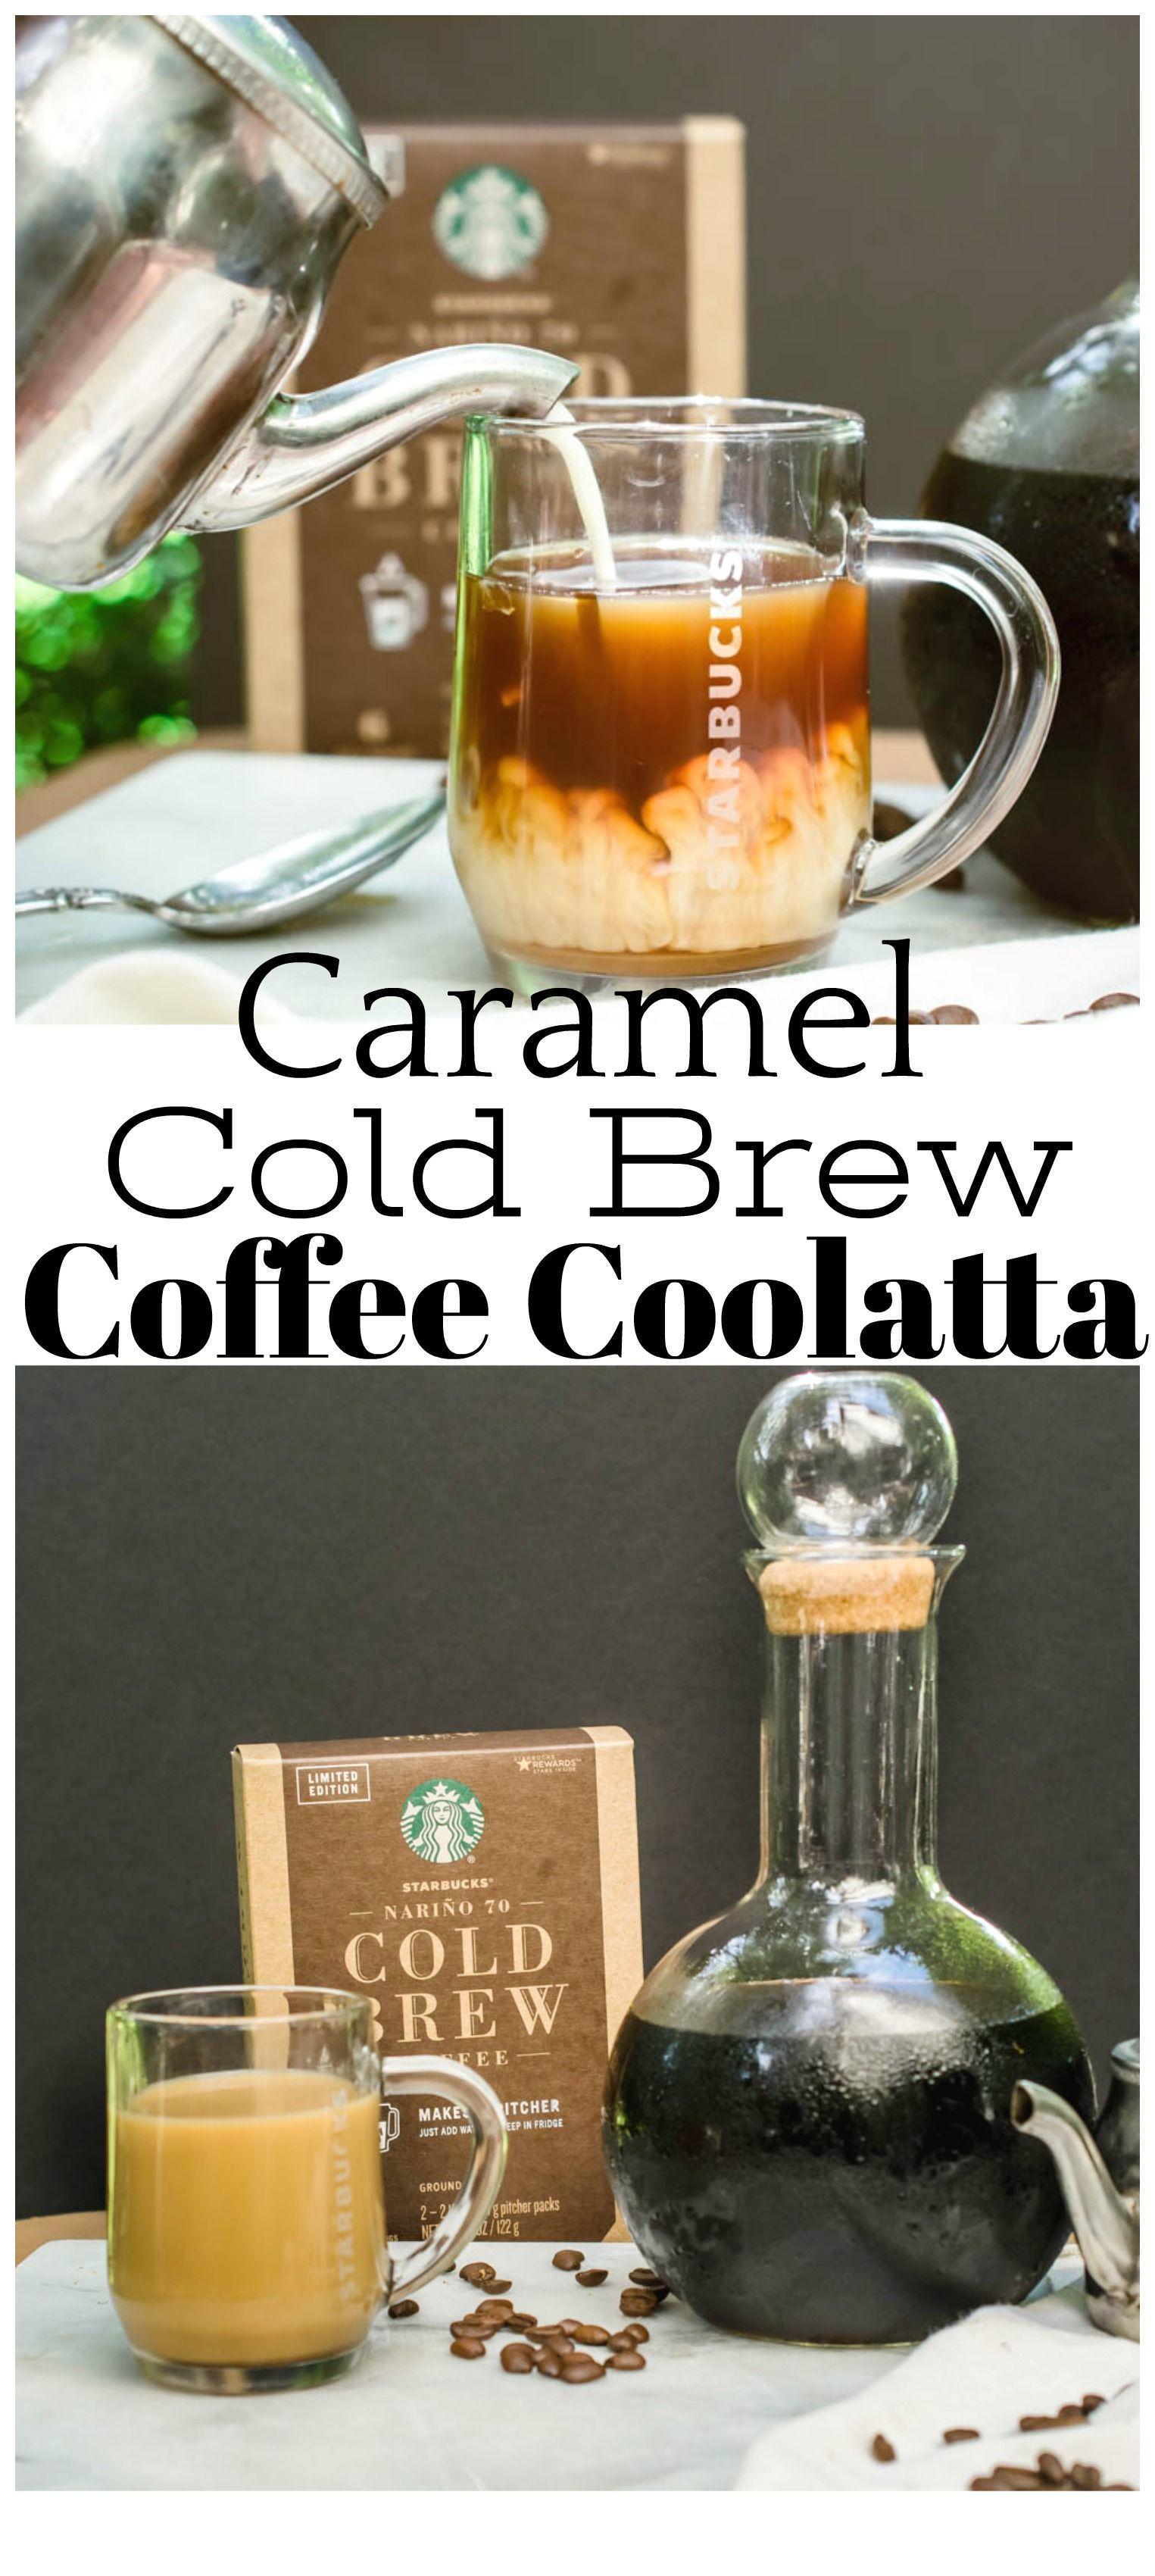 Homemade caramel cold brew coffee coolatta essentially